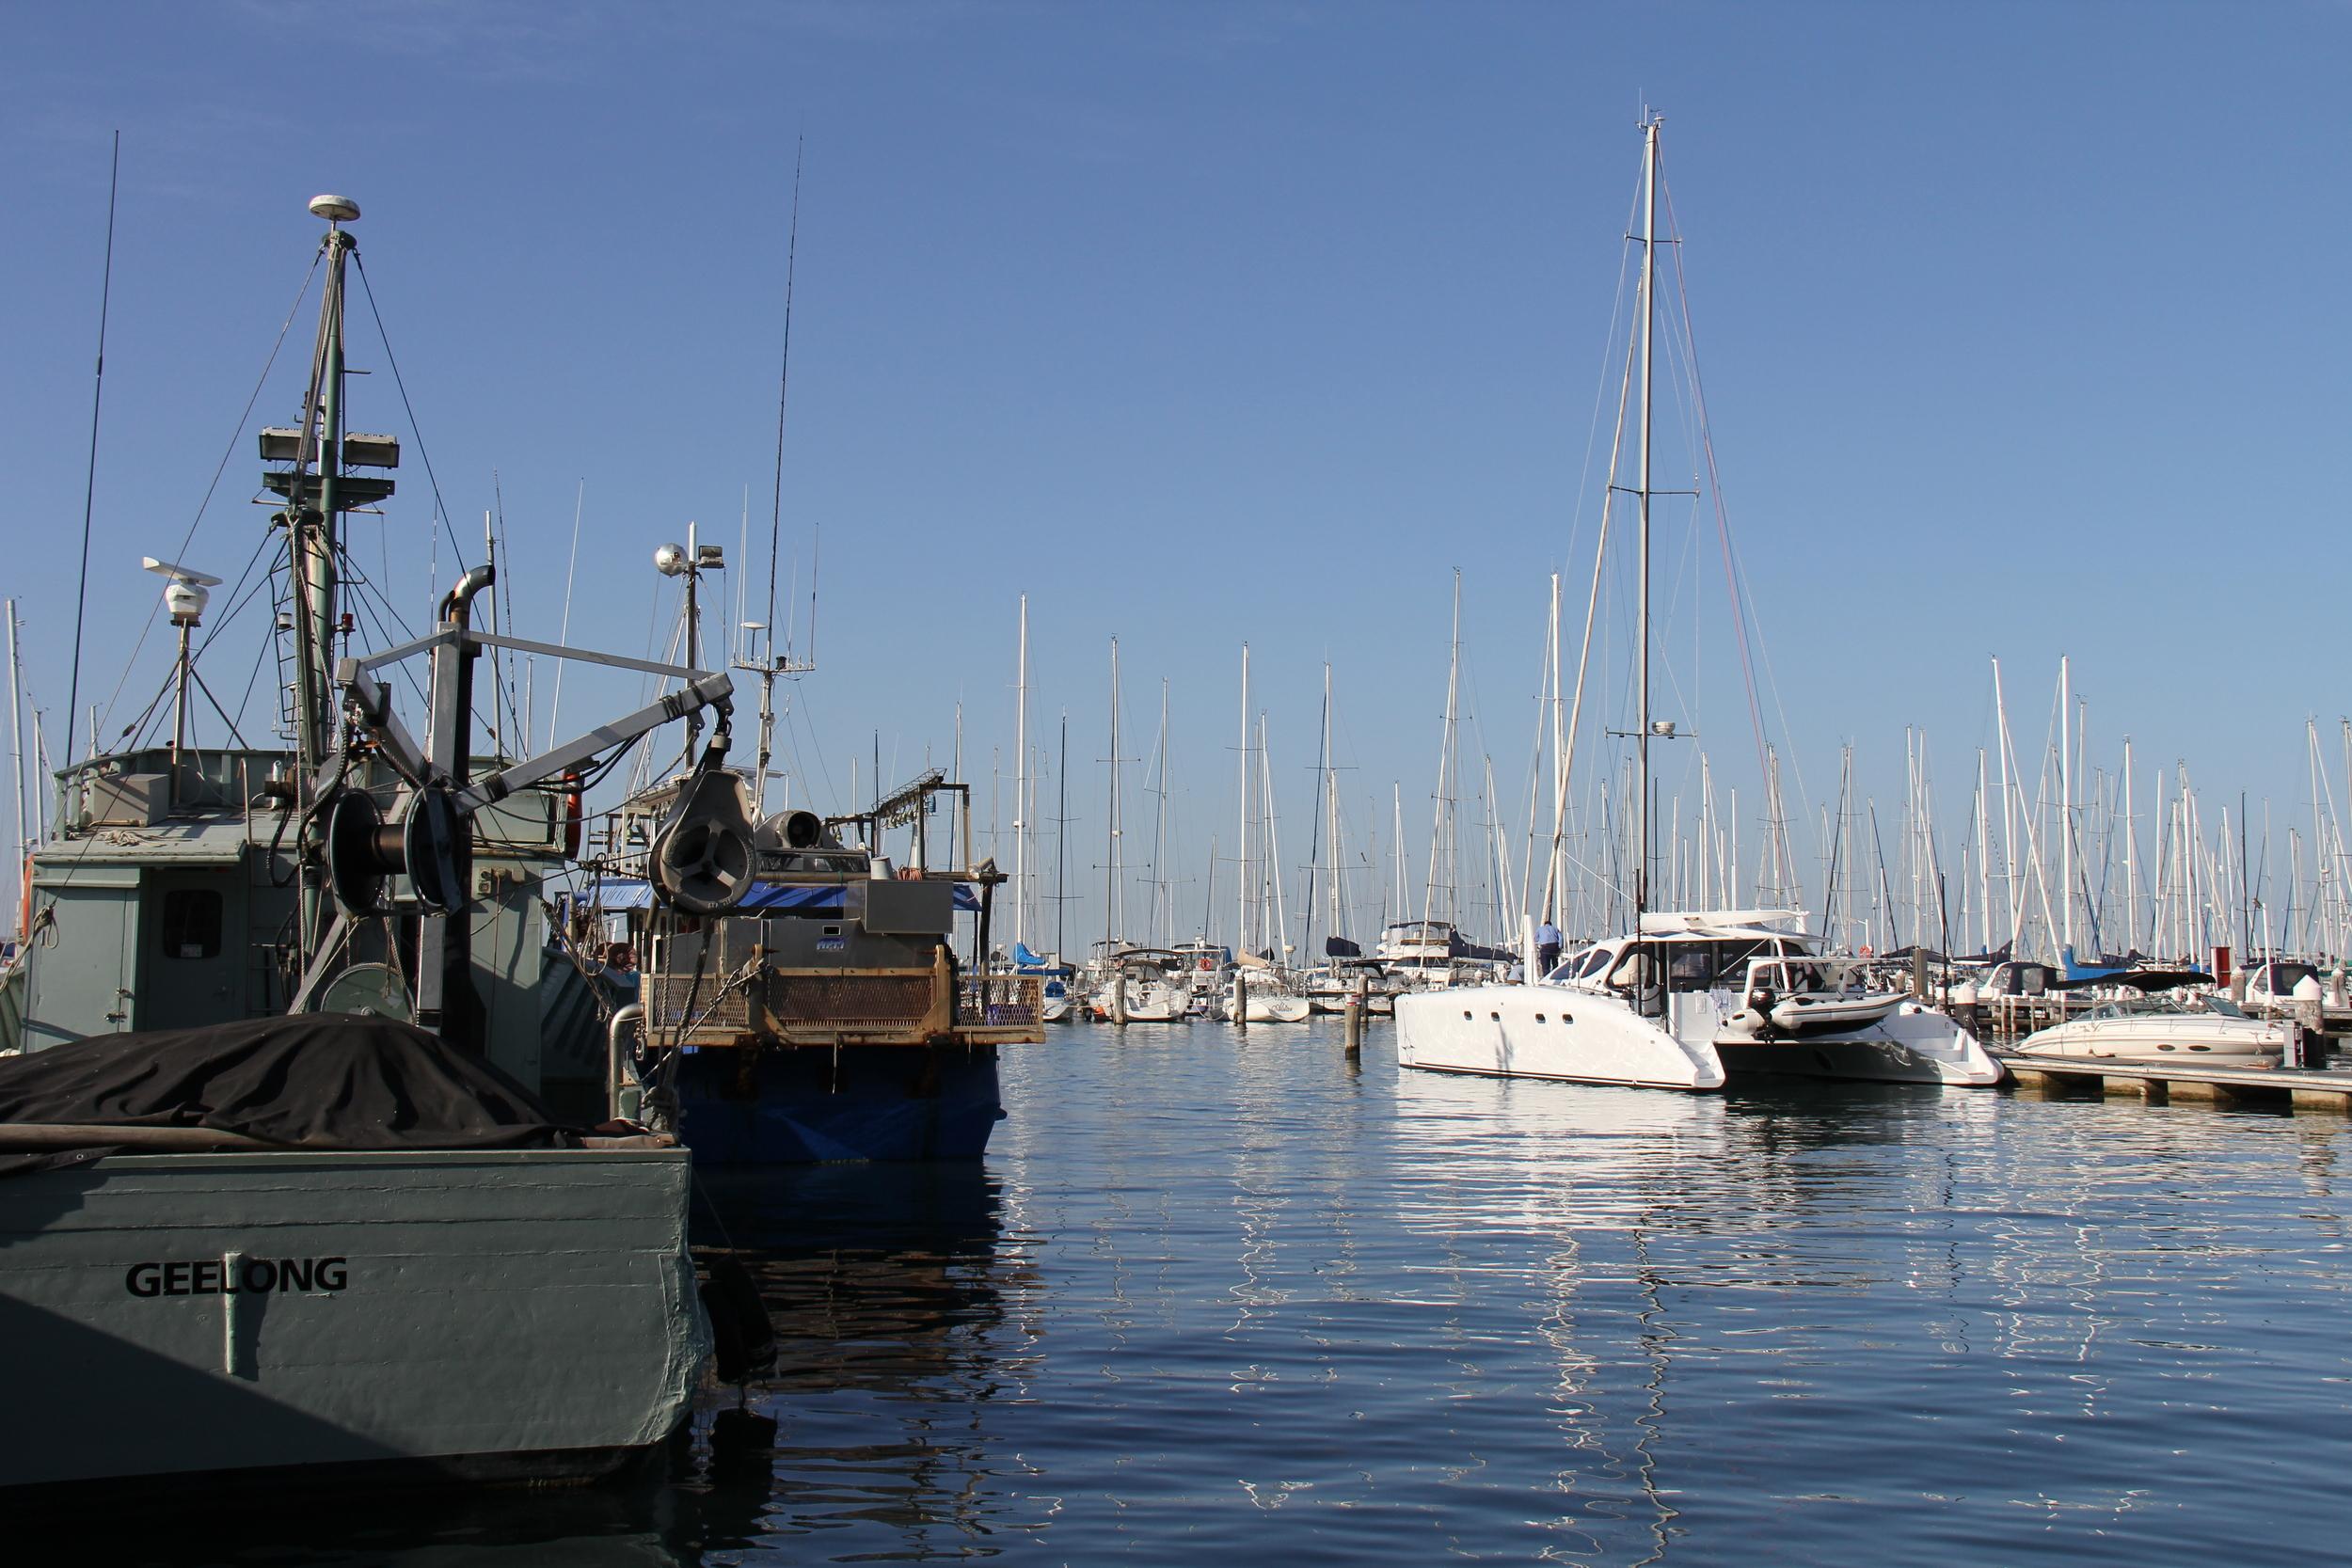 Thanks for having us Royal Geelong Yacht club.